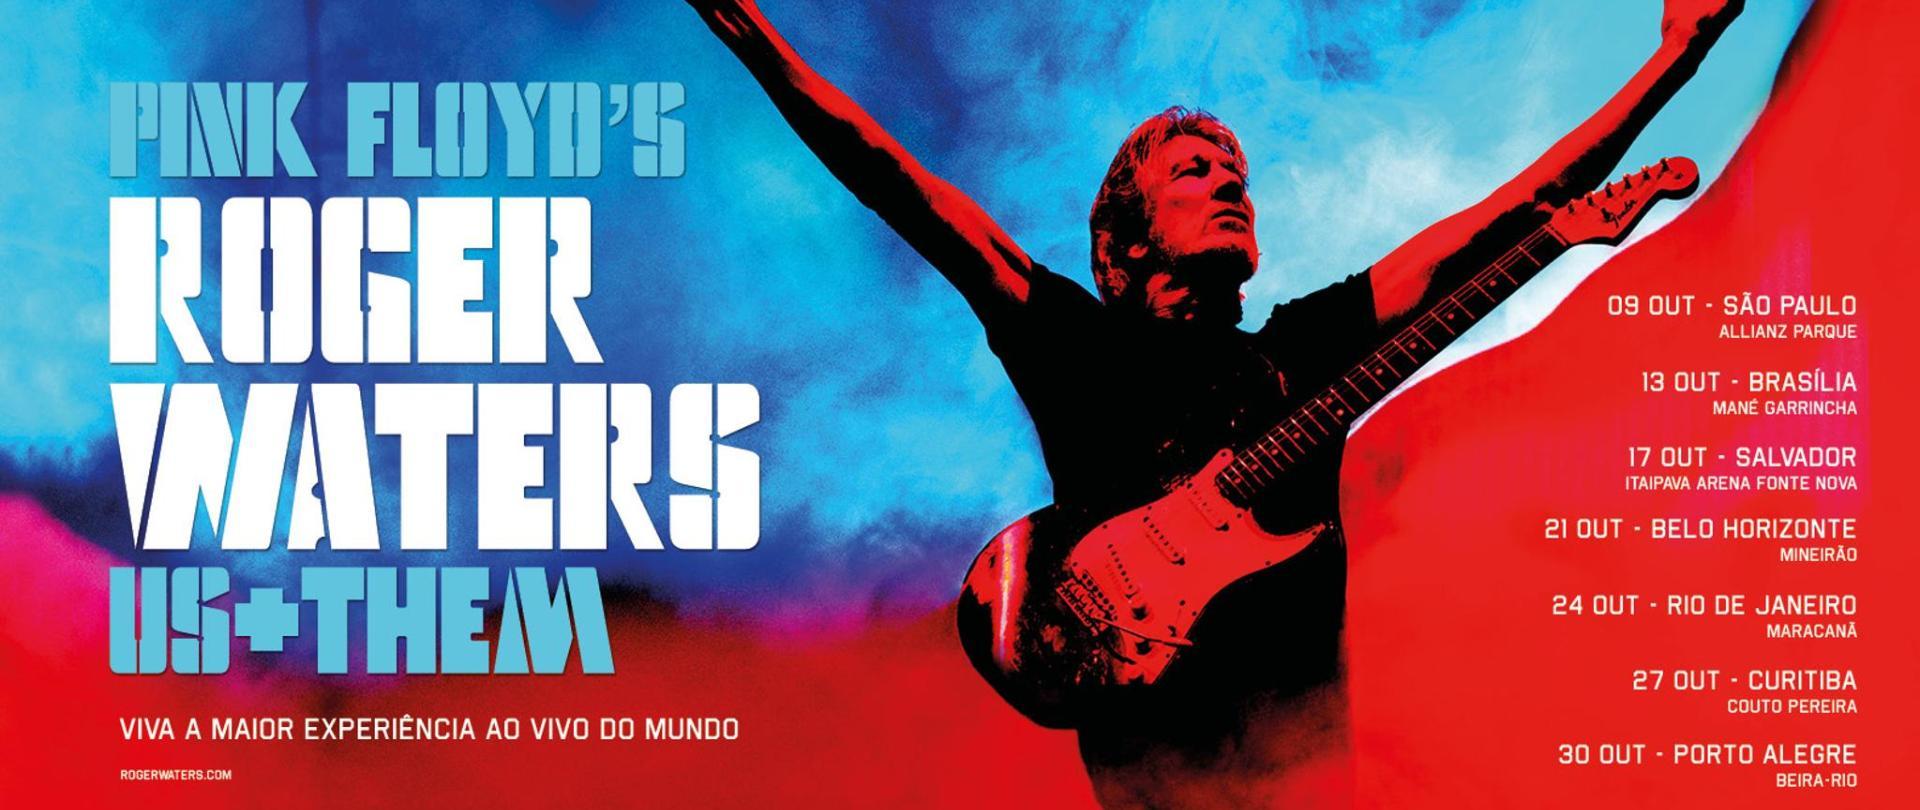 roger-waters-fará-7-shows-no-brasil-com-turne-us-them.jpg